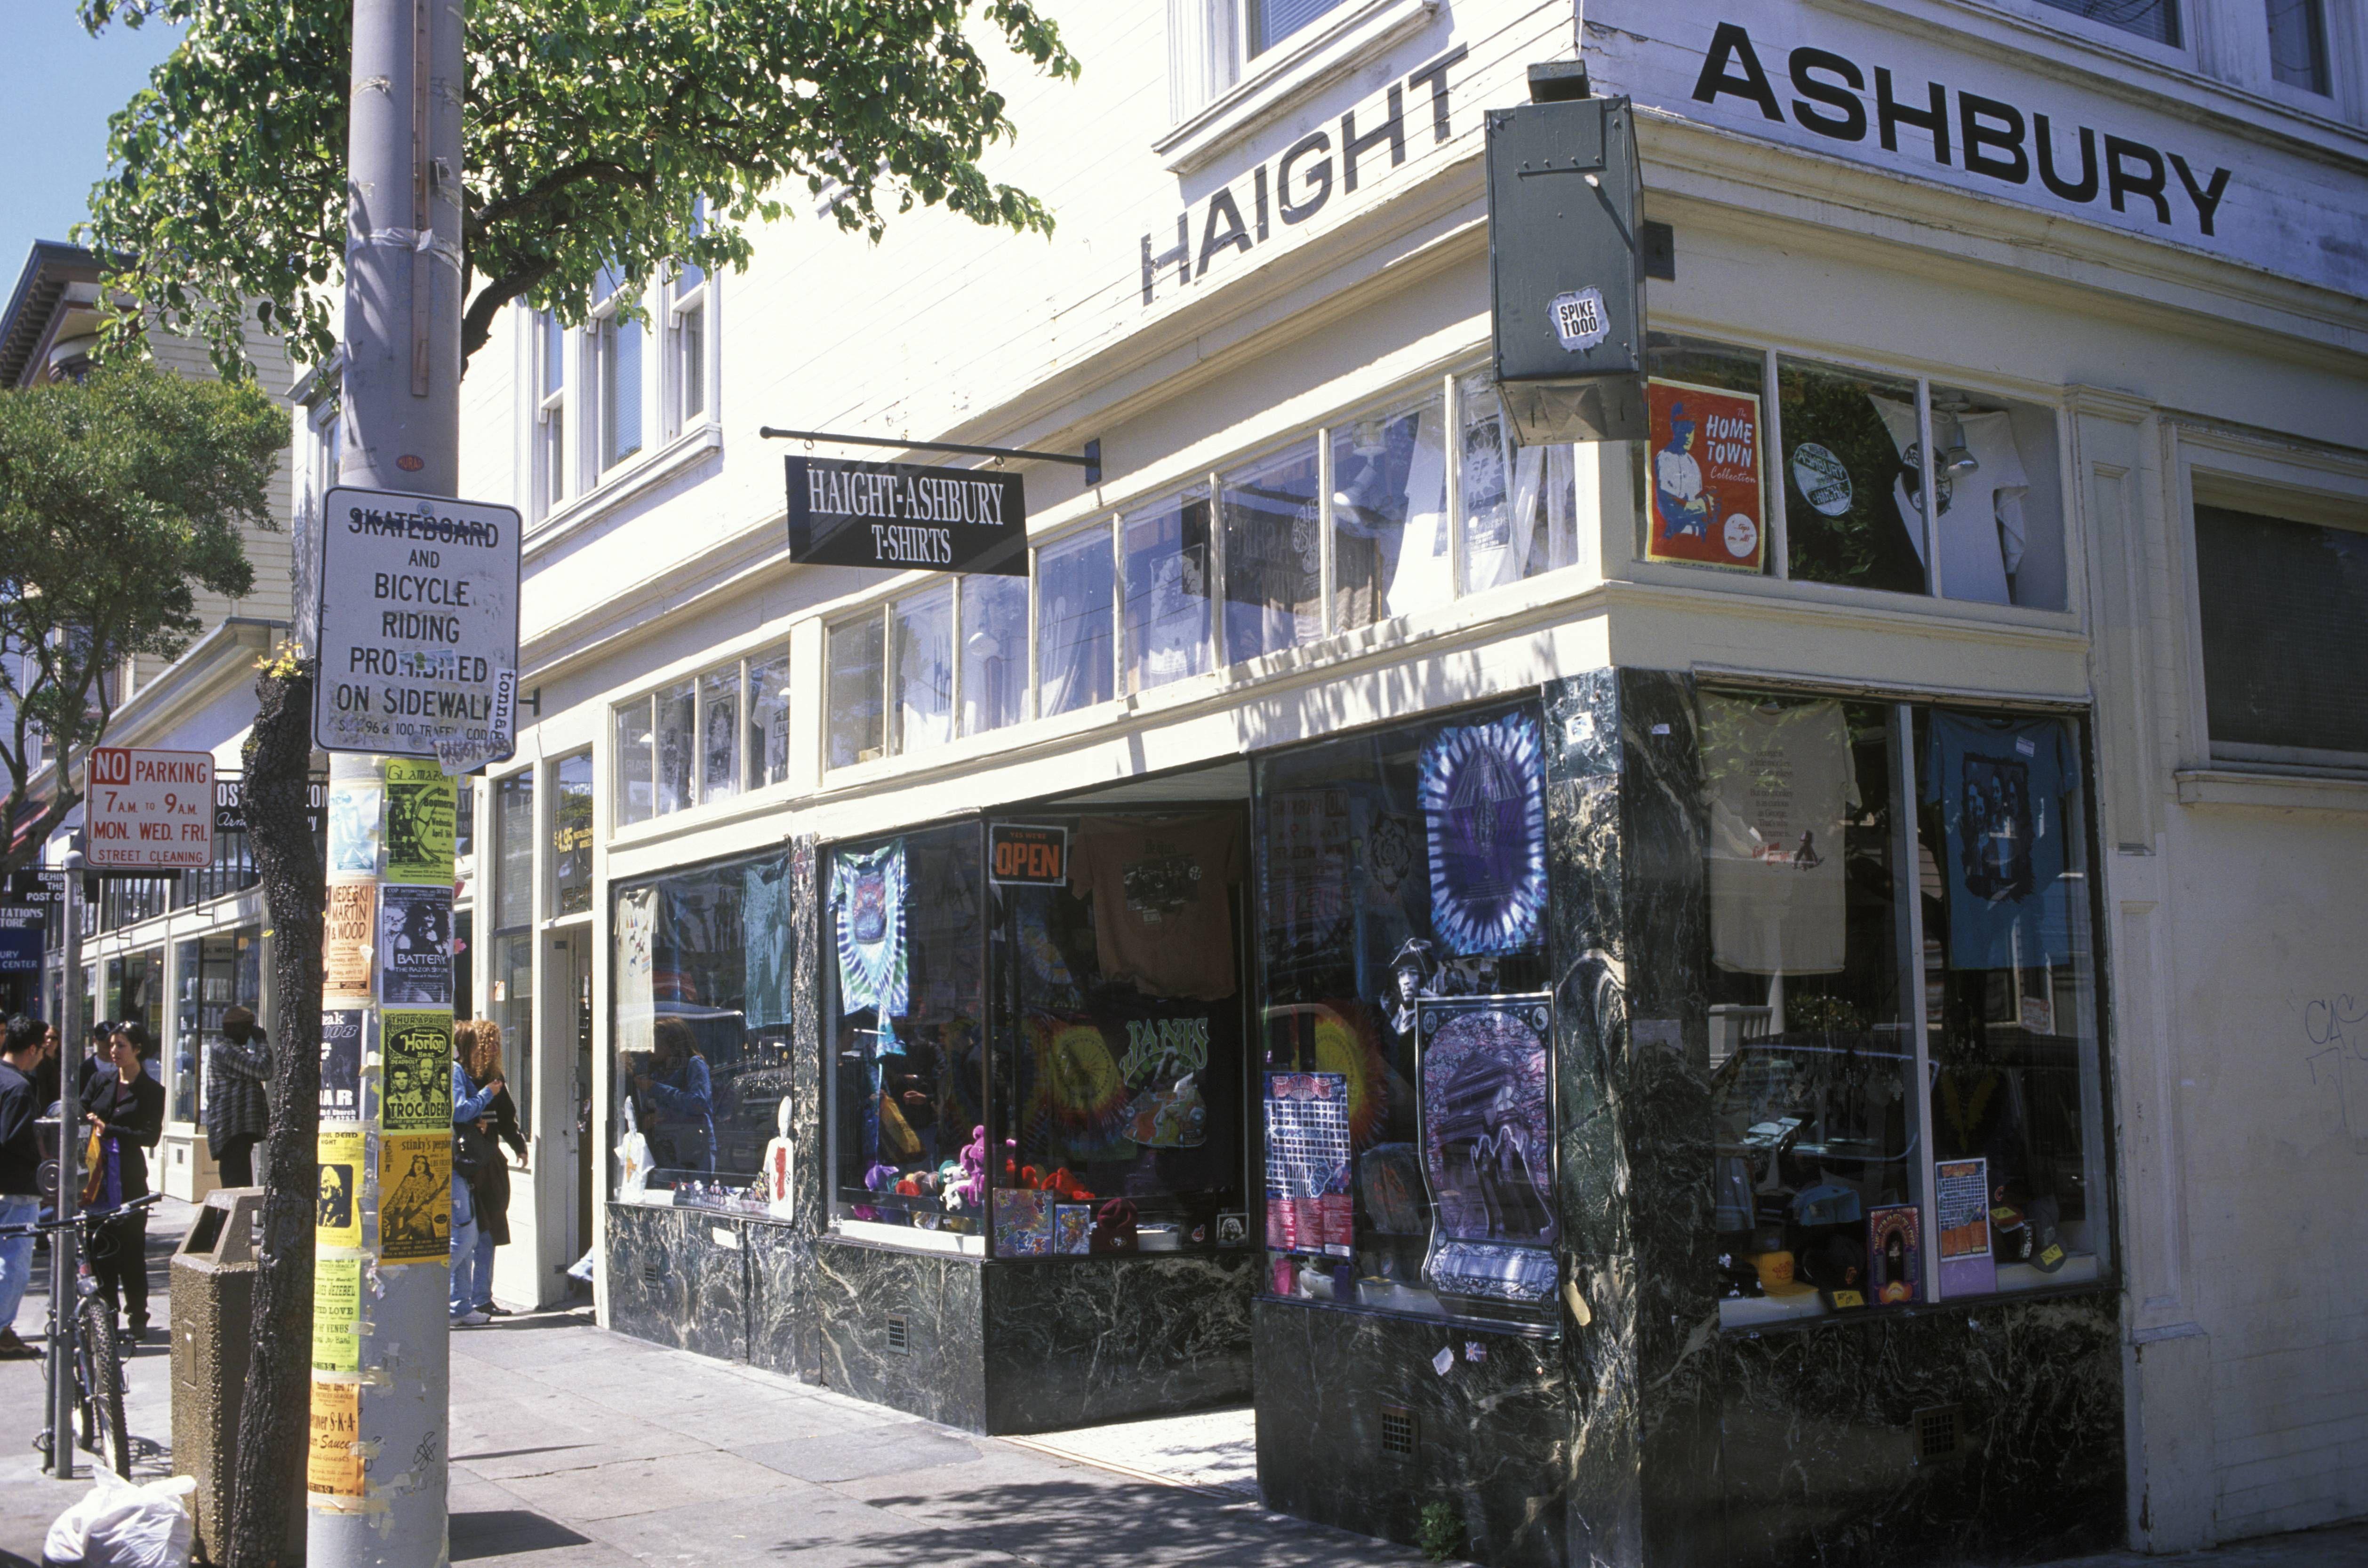 Haight Street